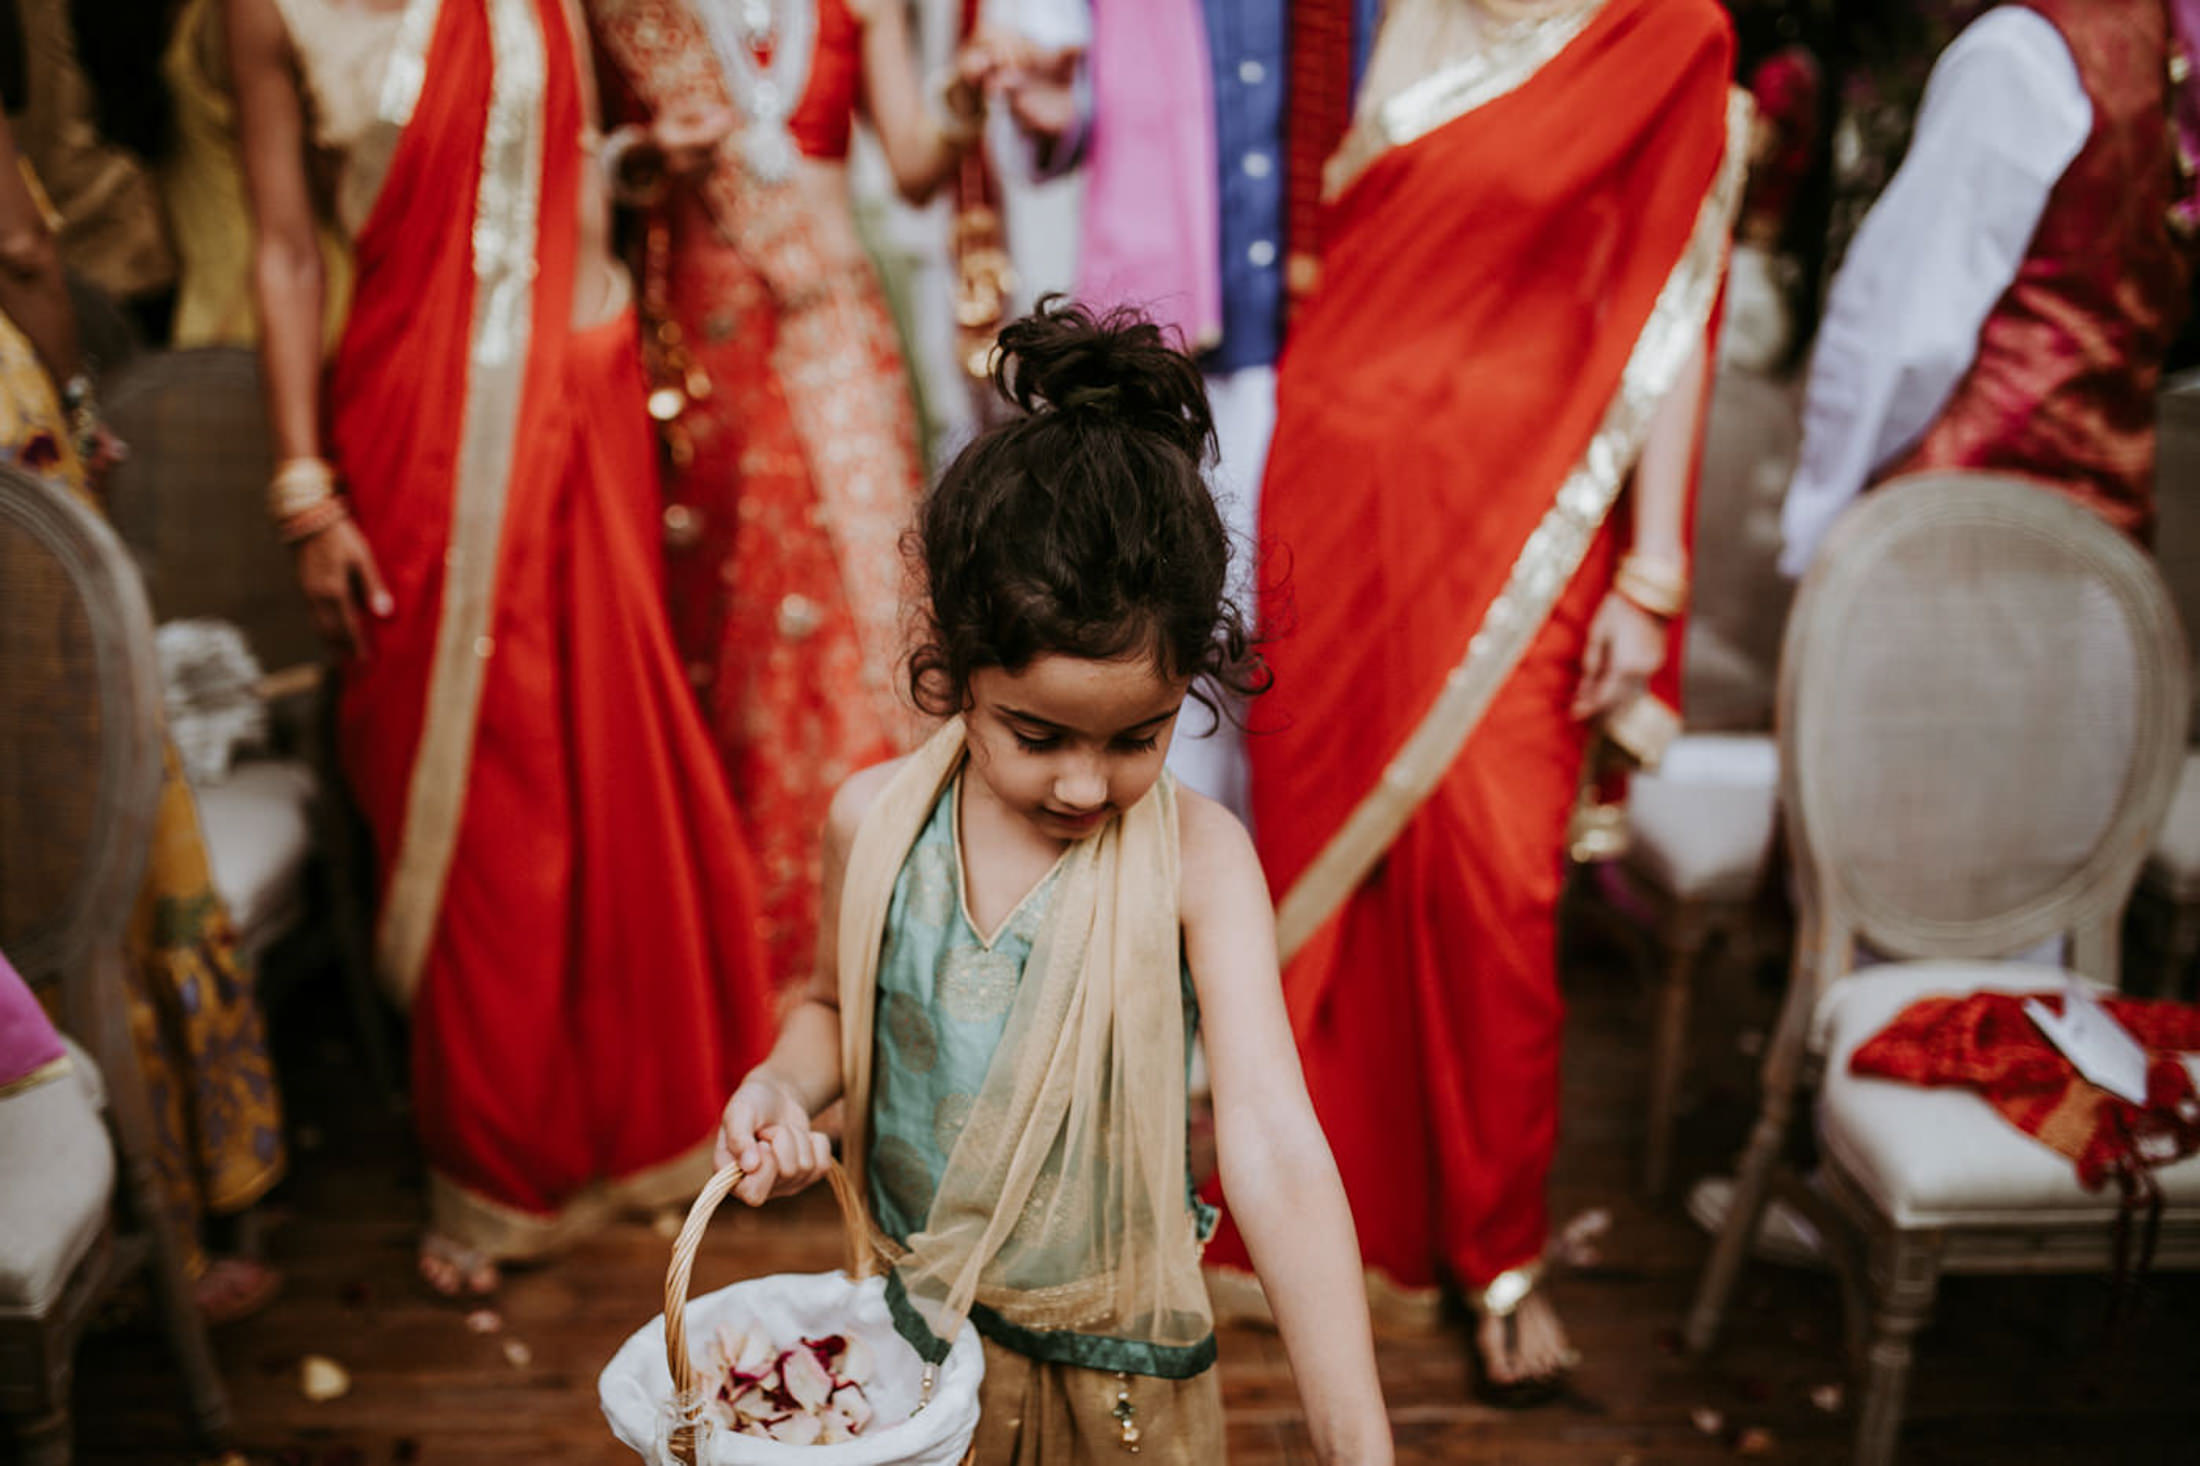 Wedding_Photographer_Mallorca_Daniela-Marquardt_Photography_New_York_Iceland_Tuscany_Santorini_Portugal_Austria_Bavaria_Elopement_Hochzeitsfotograf_AntjeRajat2_45